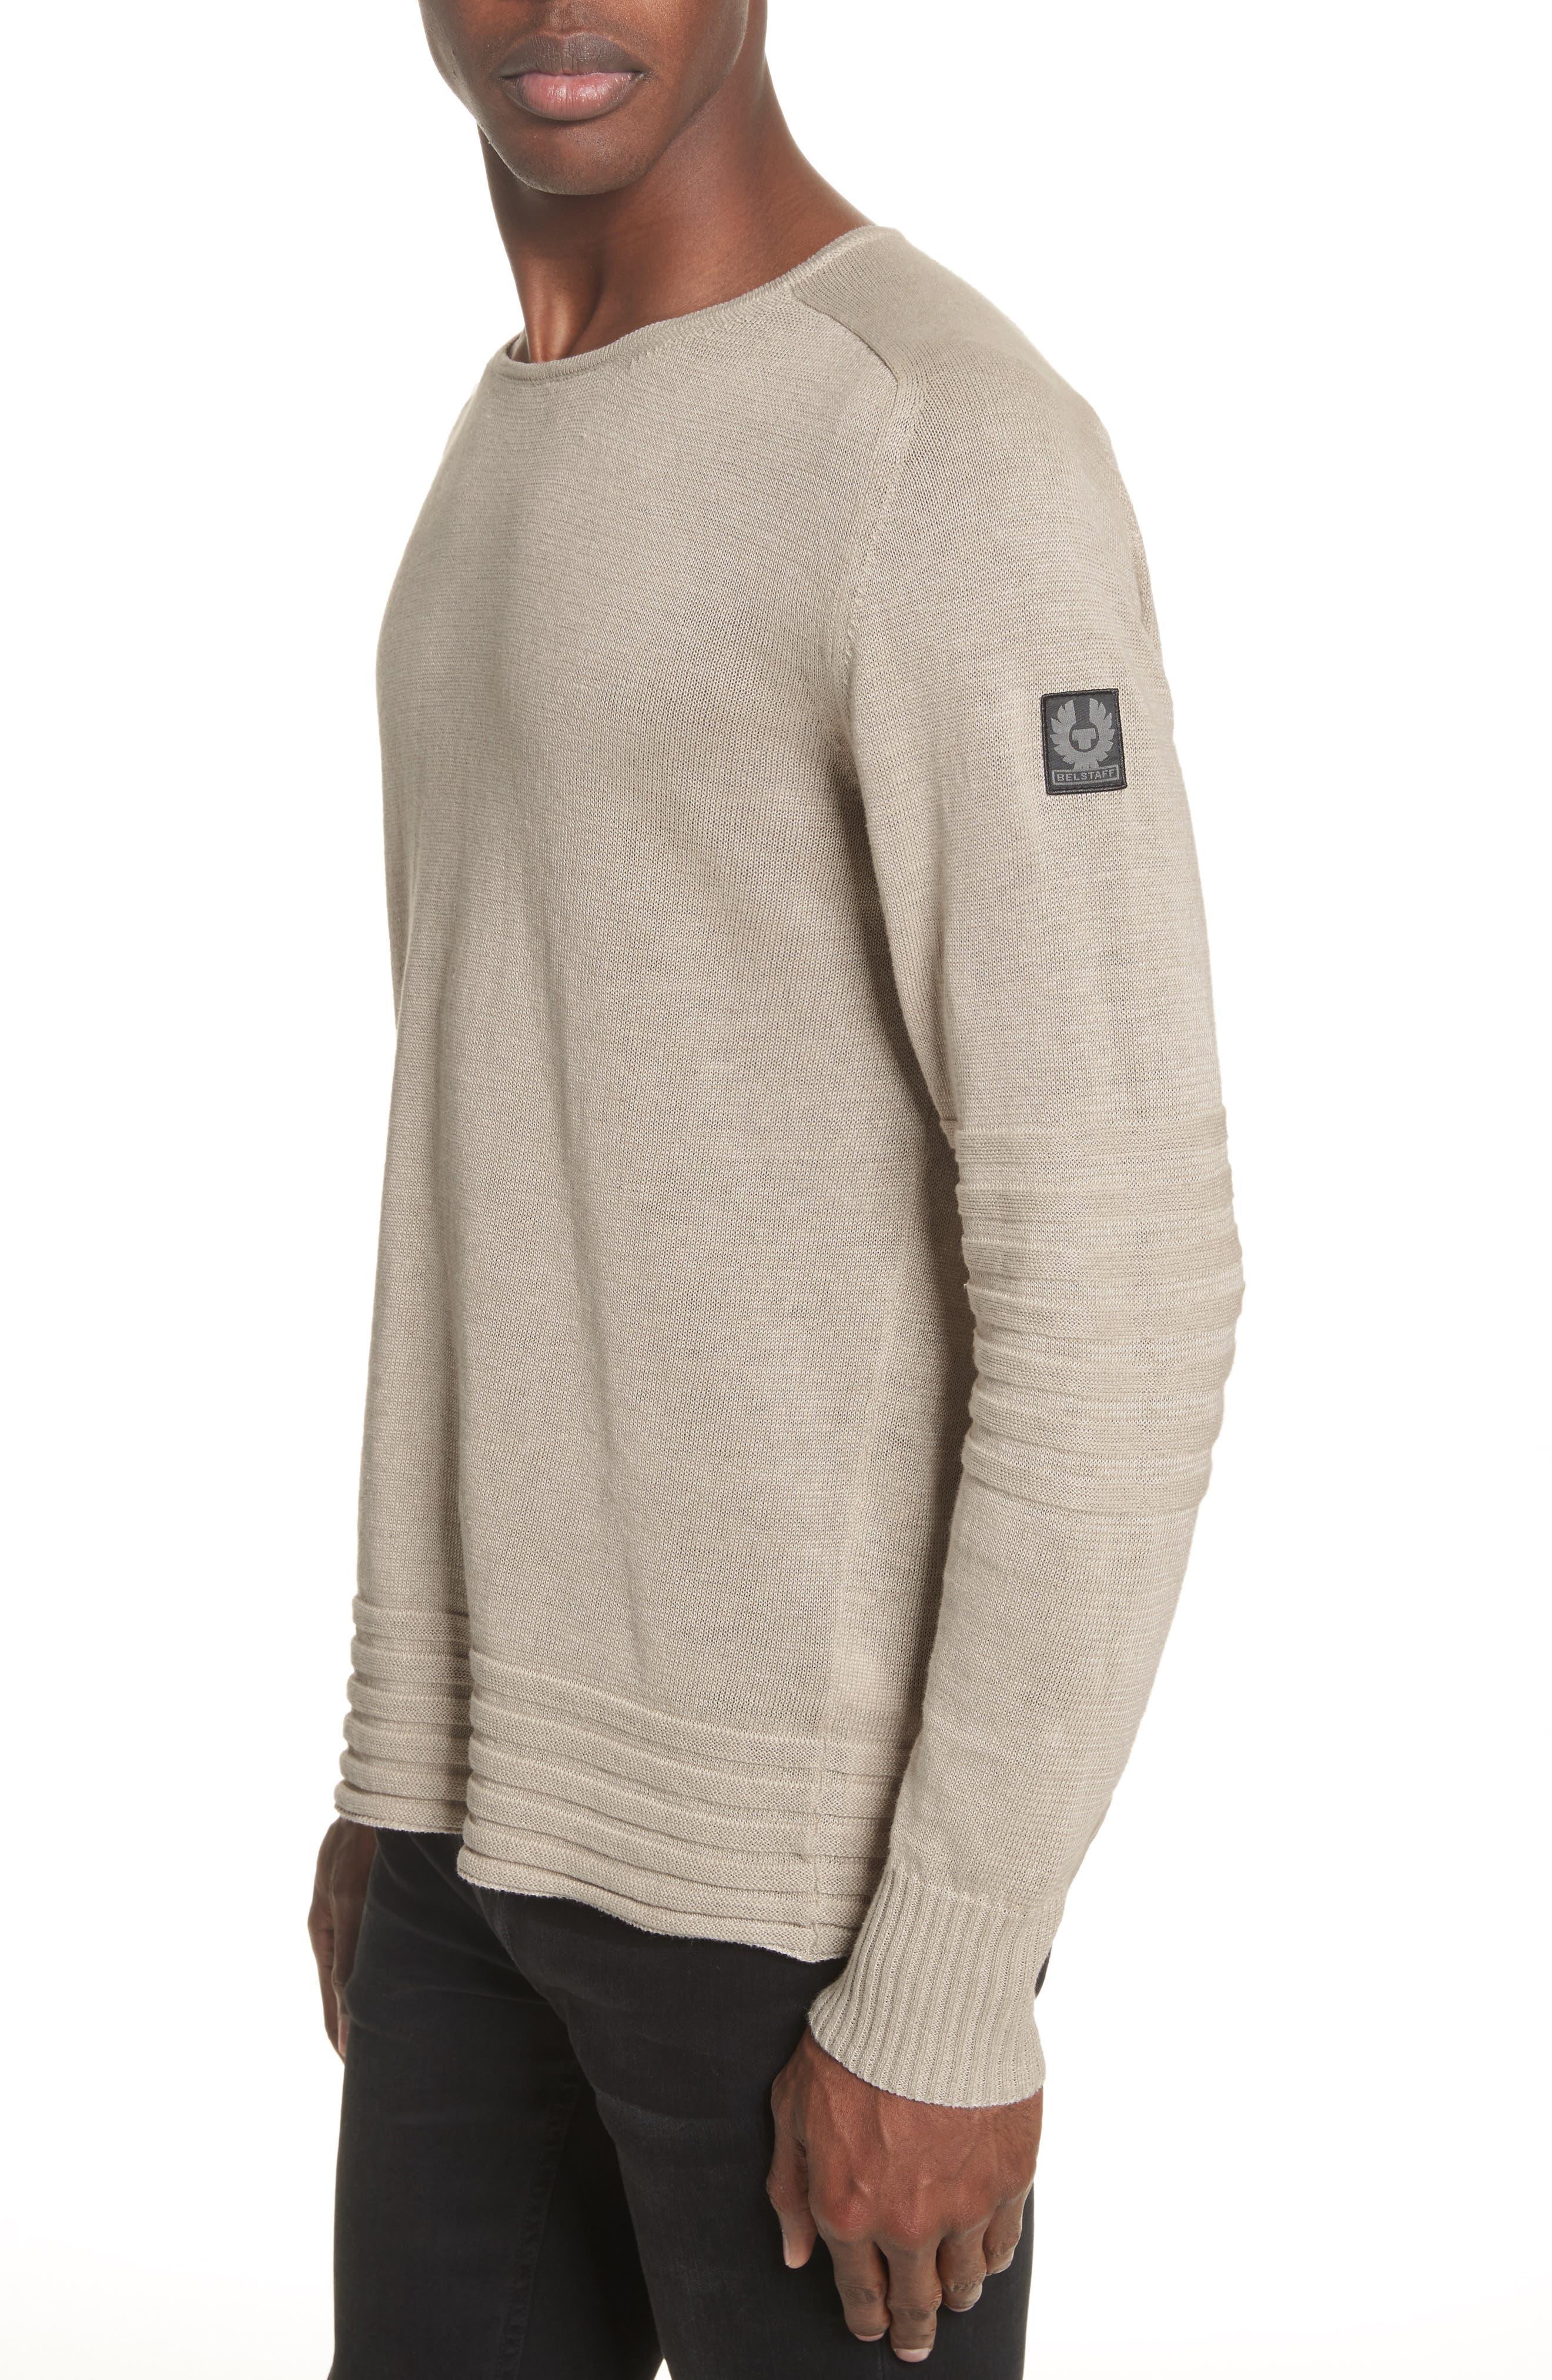 Exford Linen Crewneck Sweater,                             Main thumbnail 1, color,                             270